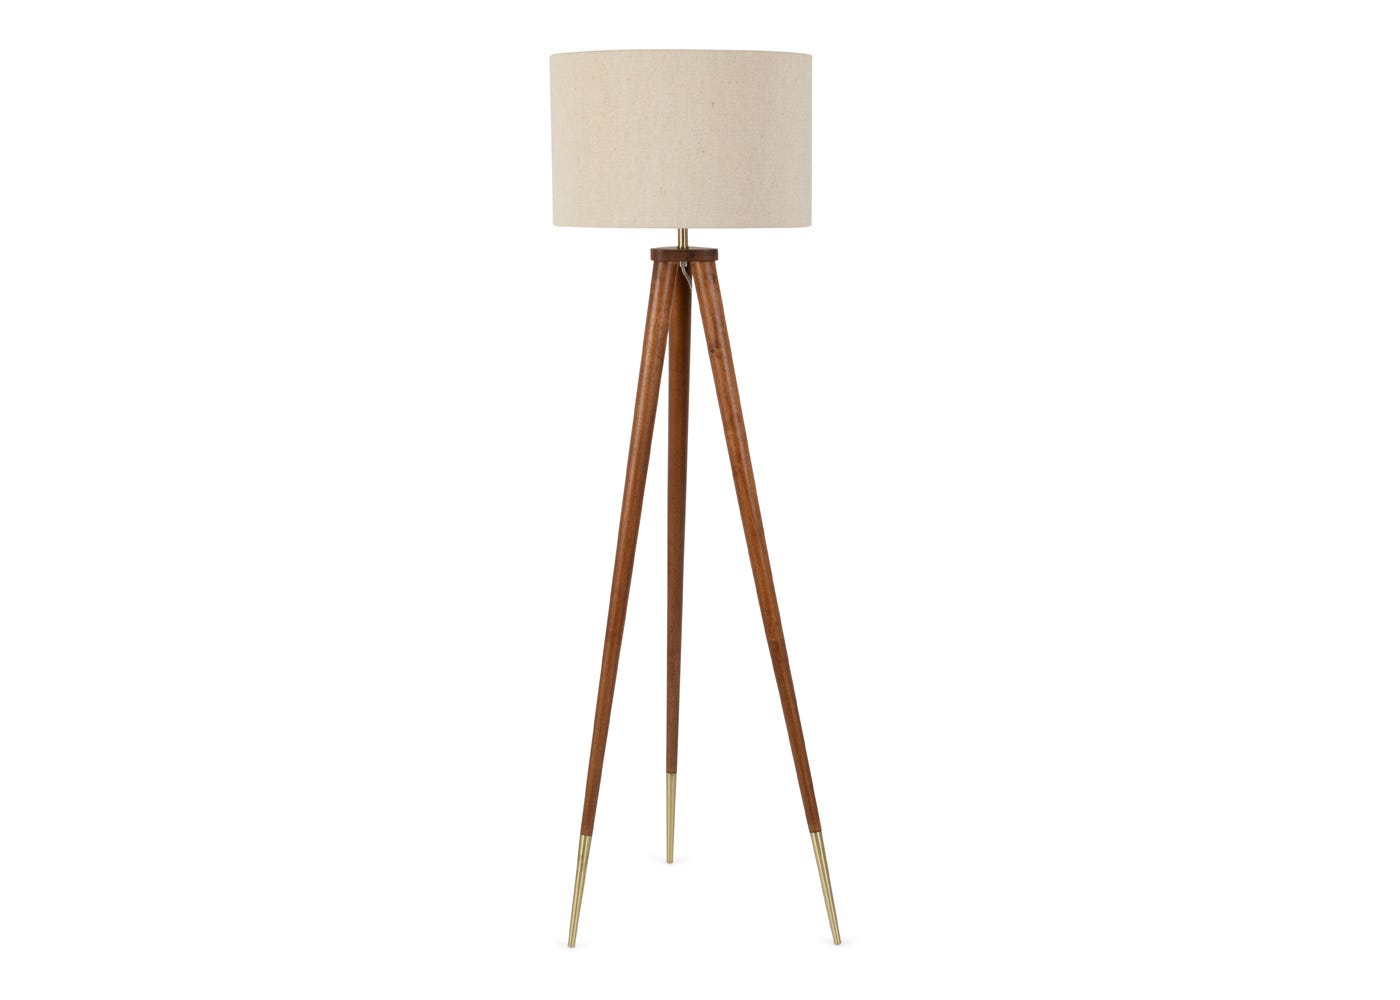 Hawkins Wooden Tripod Floor Lamp with Shade